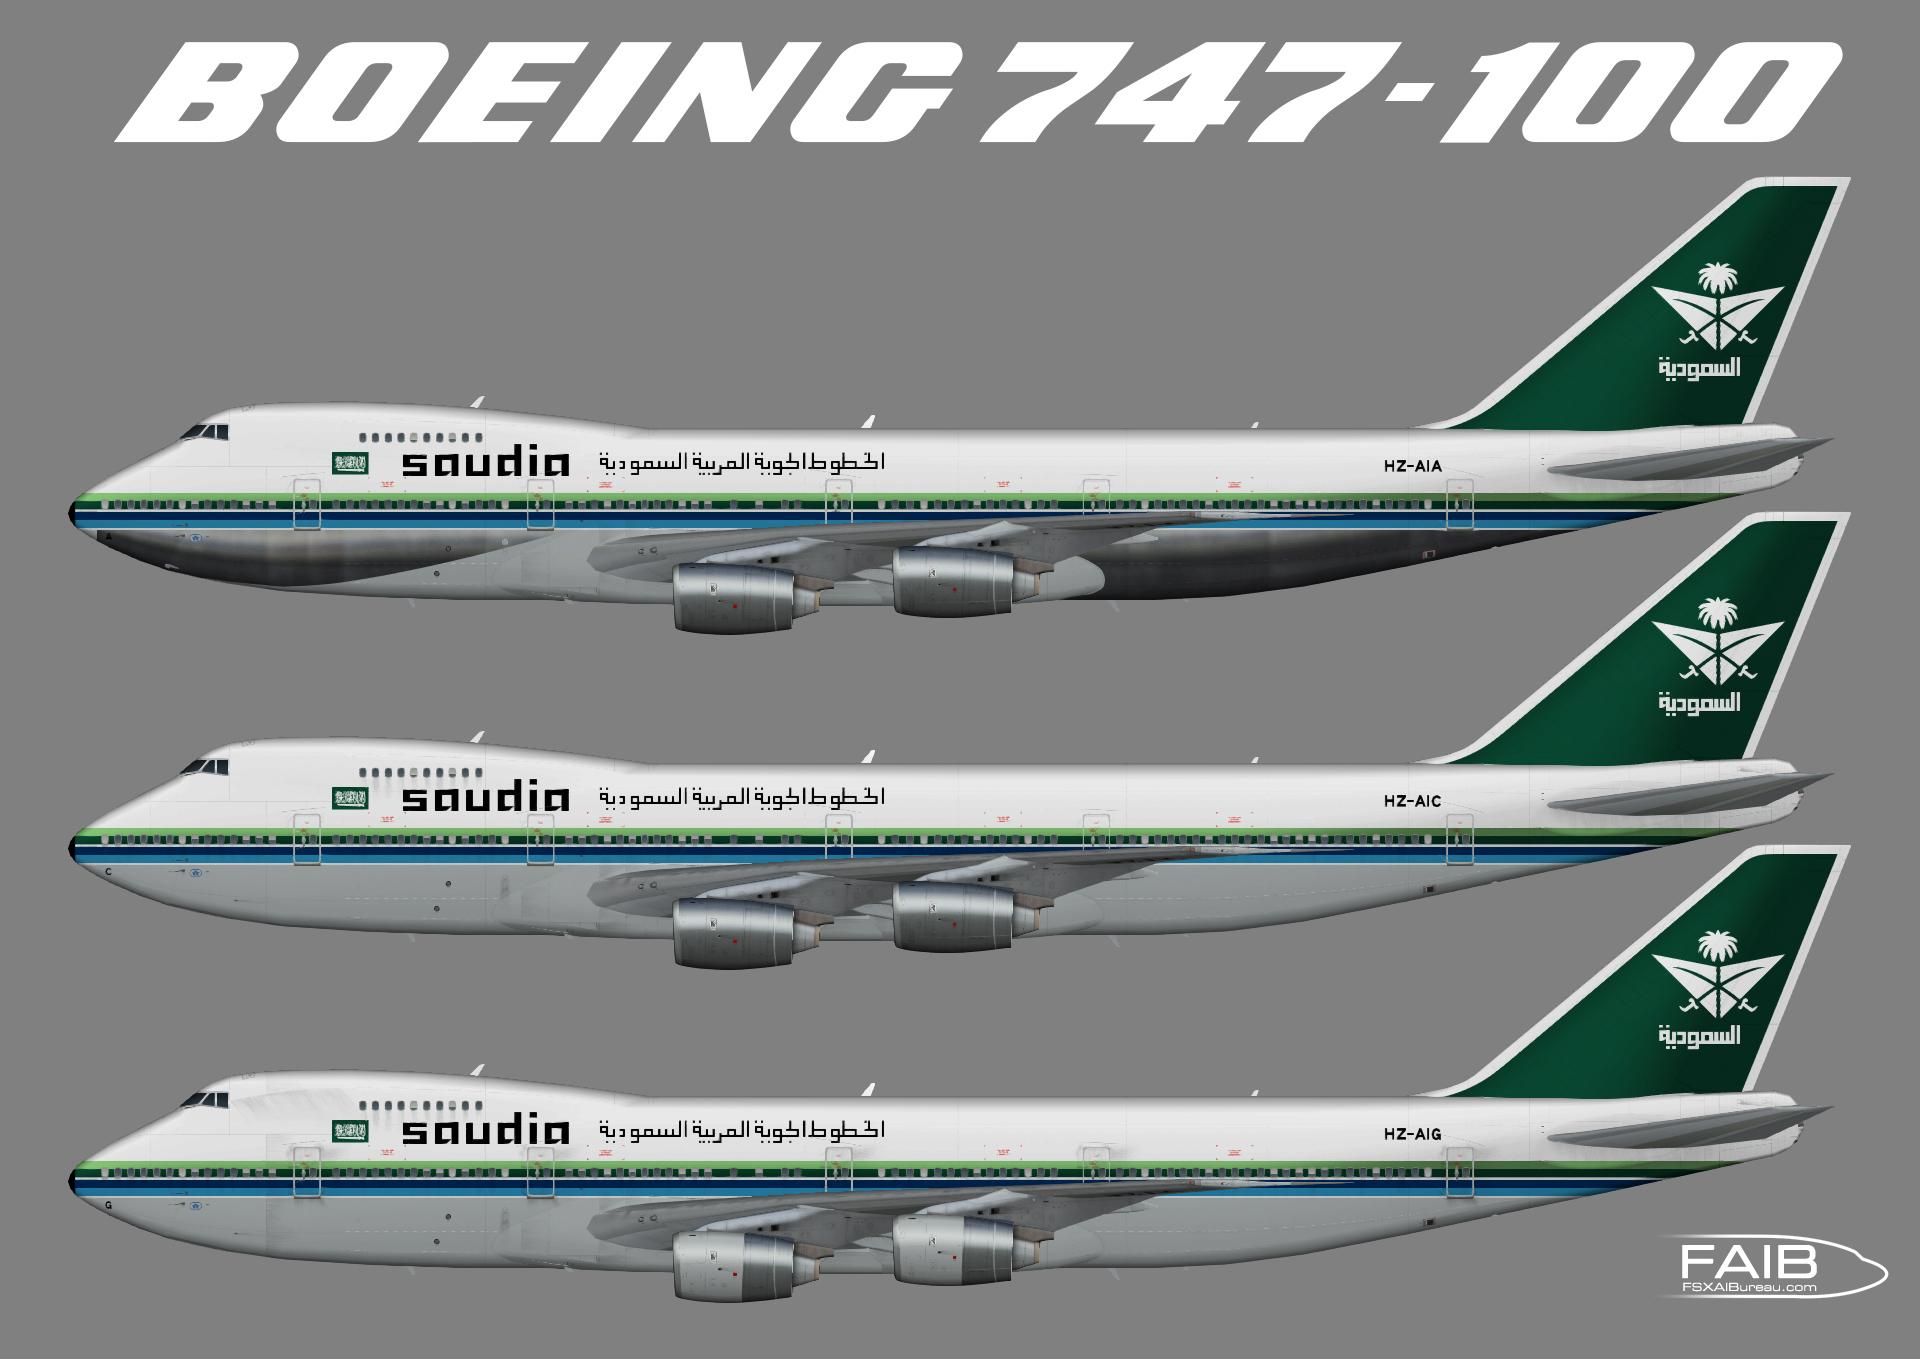 Saudia Boeing 747-100